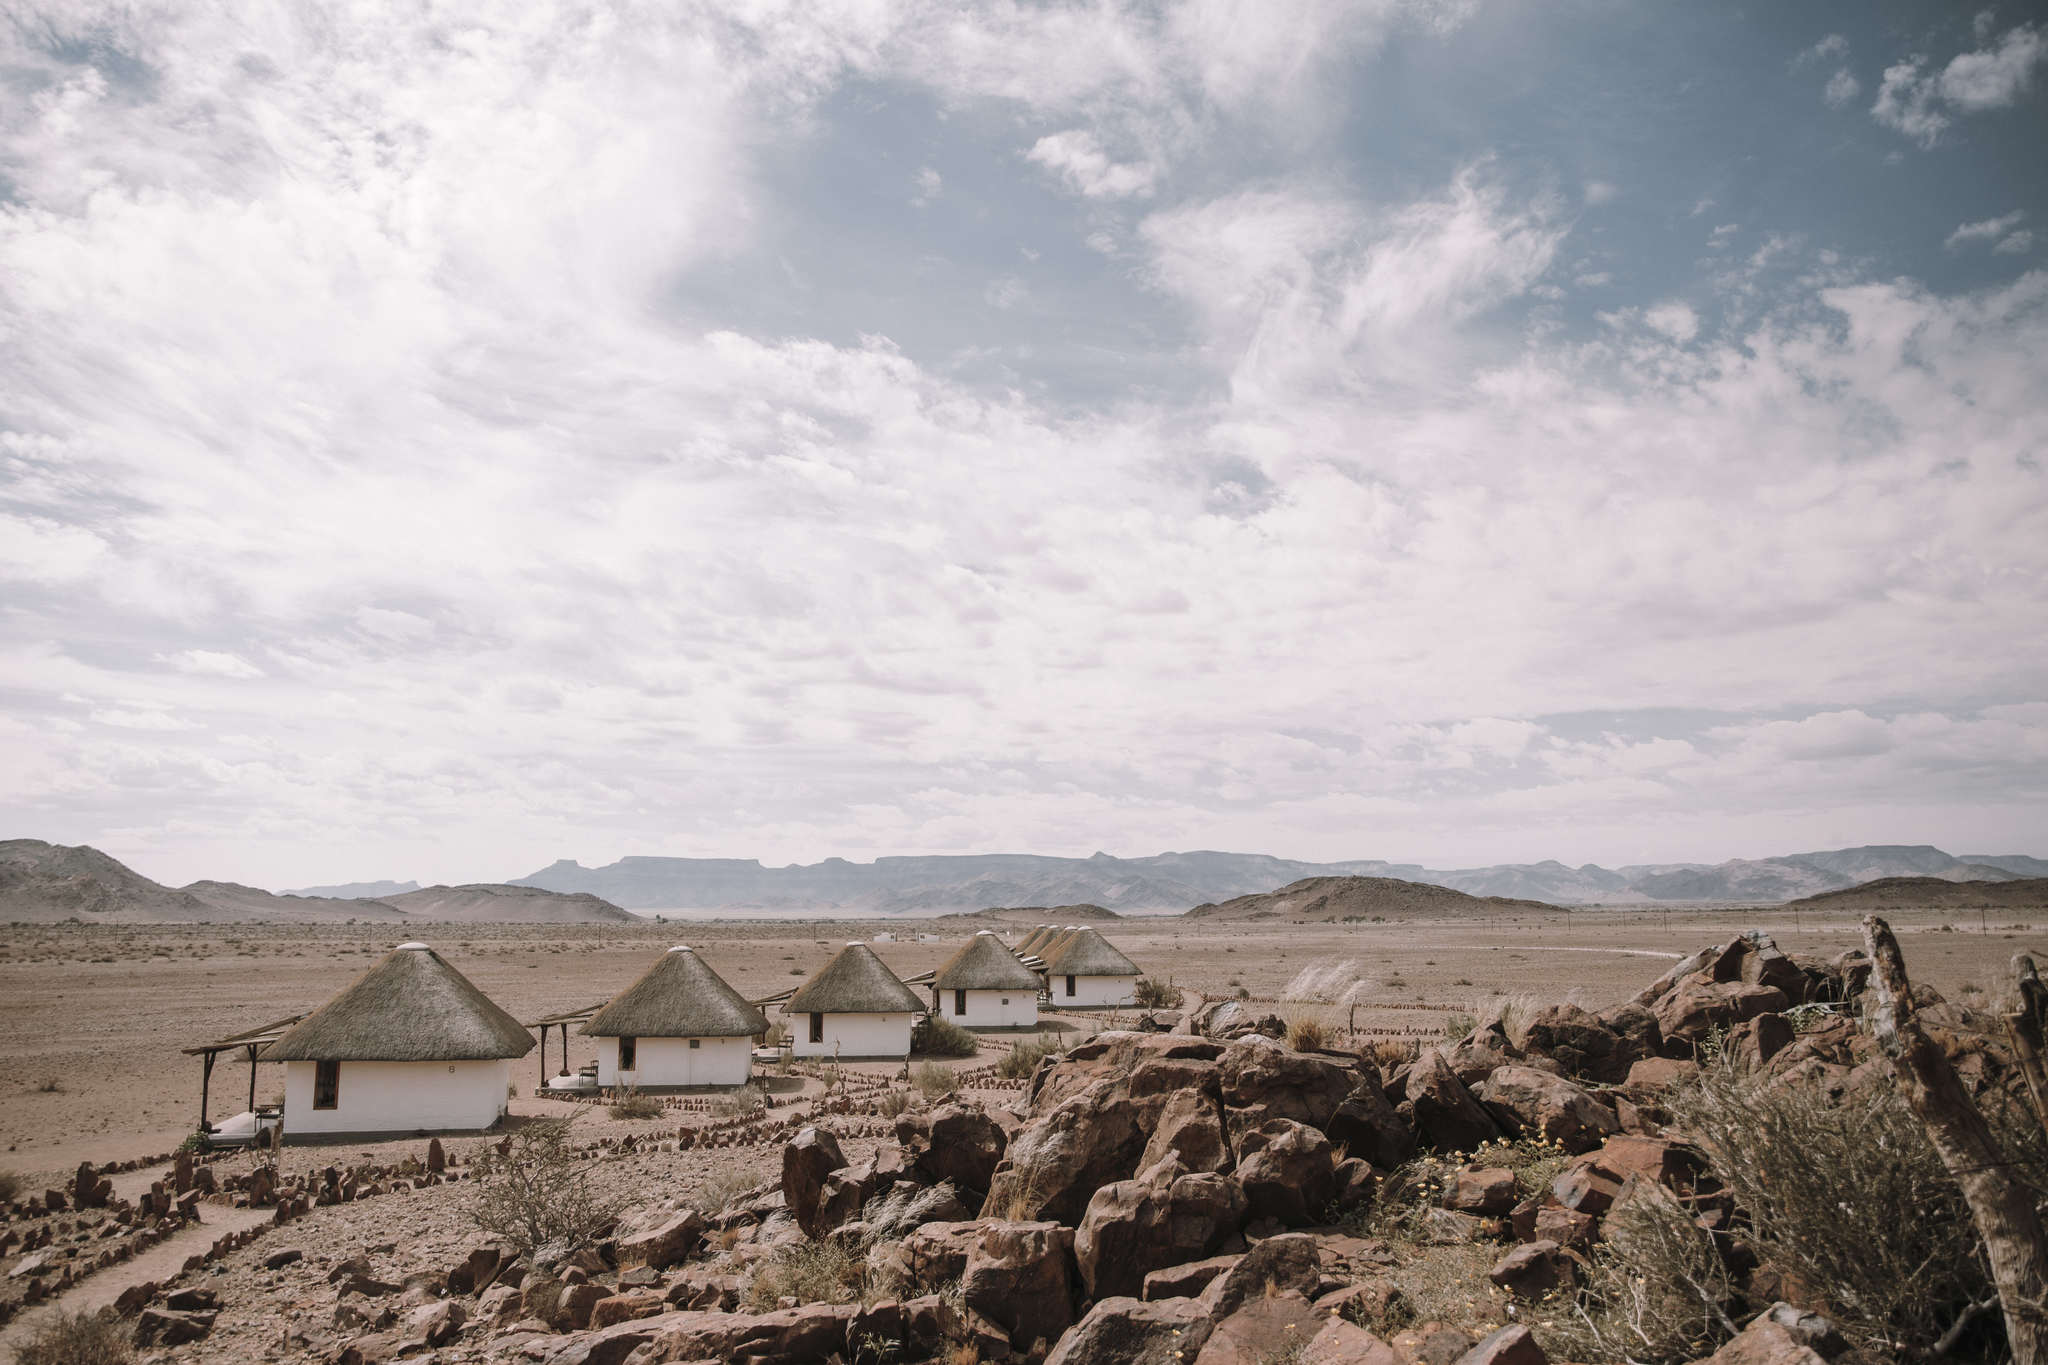 Desert Homestead Lodge Namib und Sossusvlei im Blick